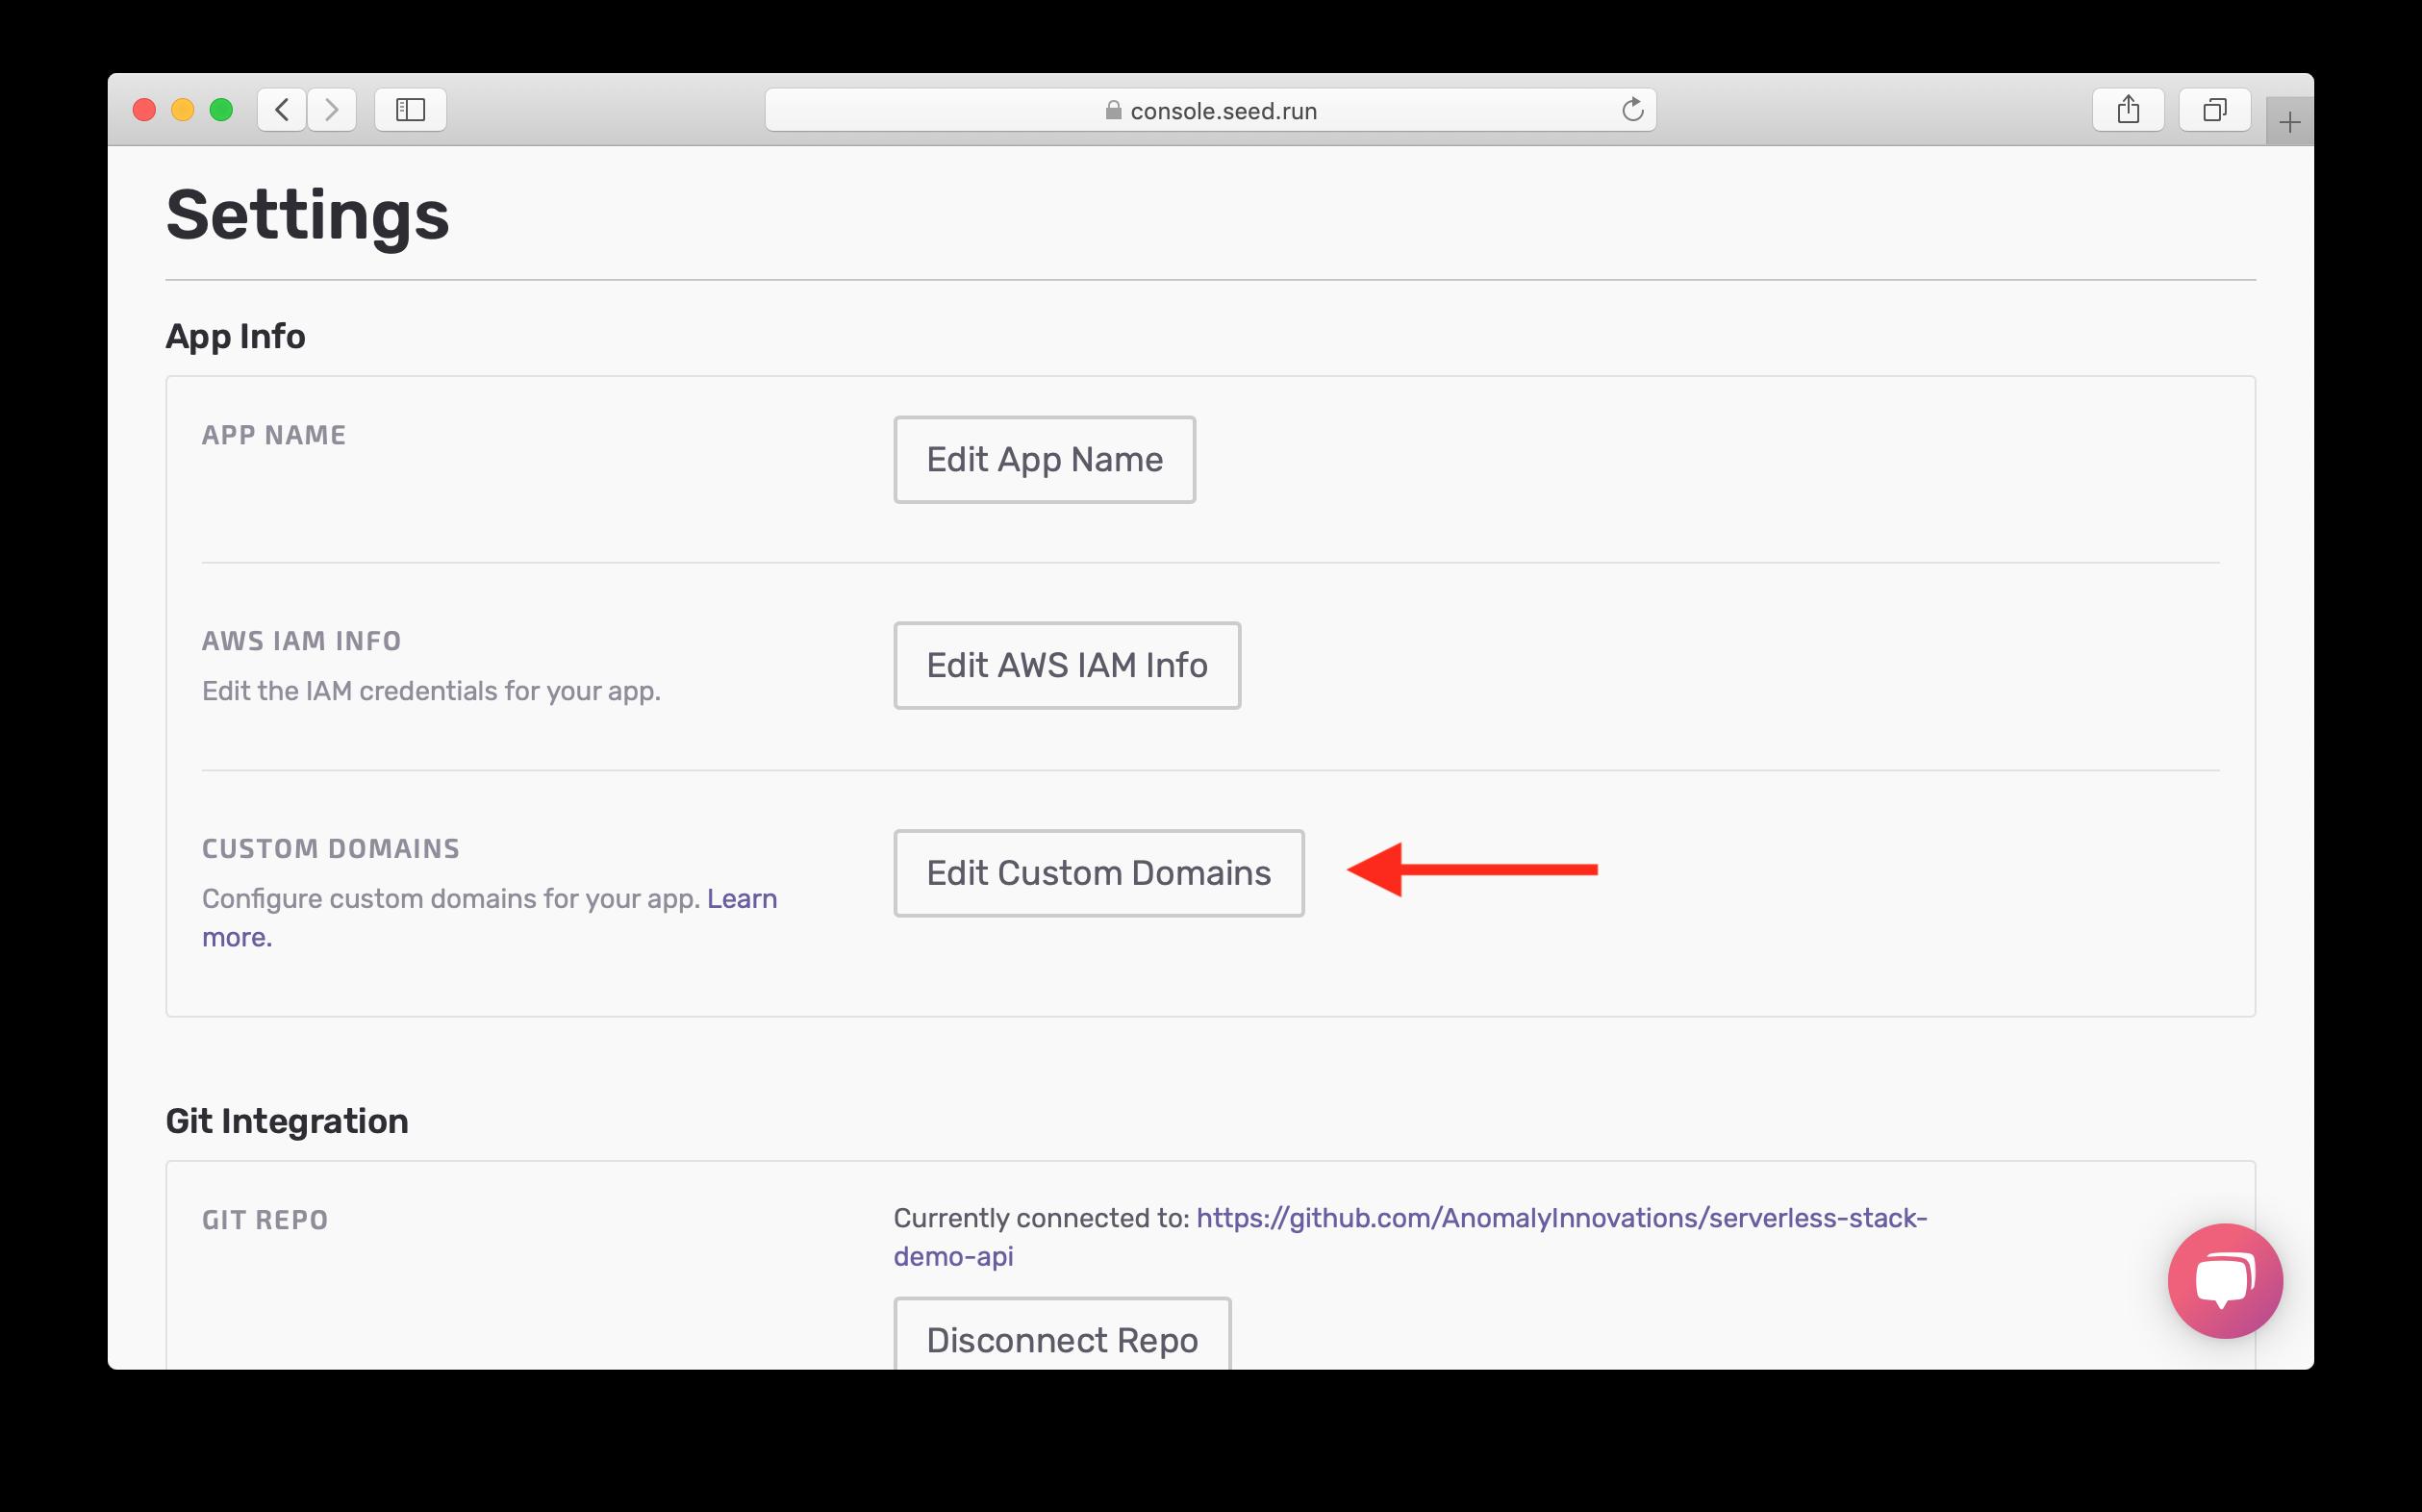 Click Edit Custom Domains in app settings screenshot